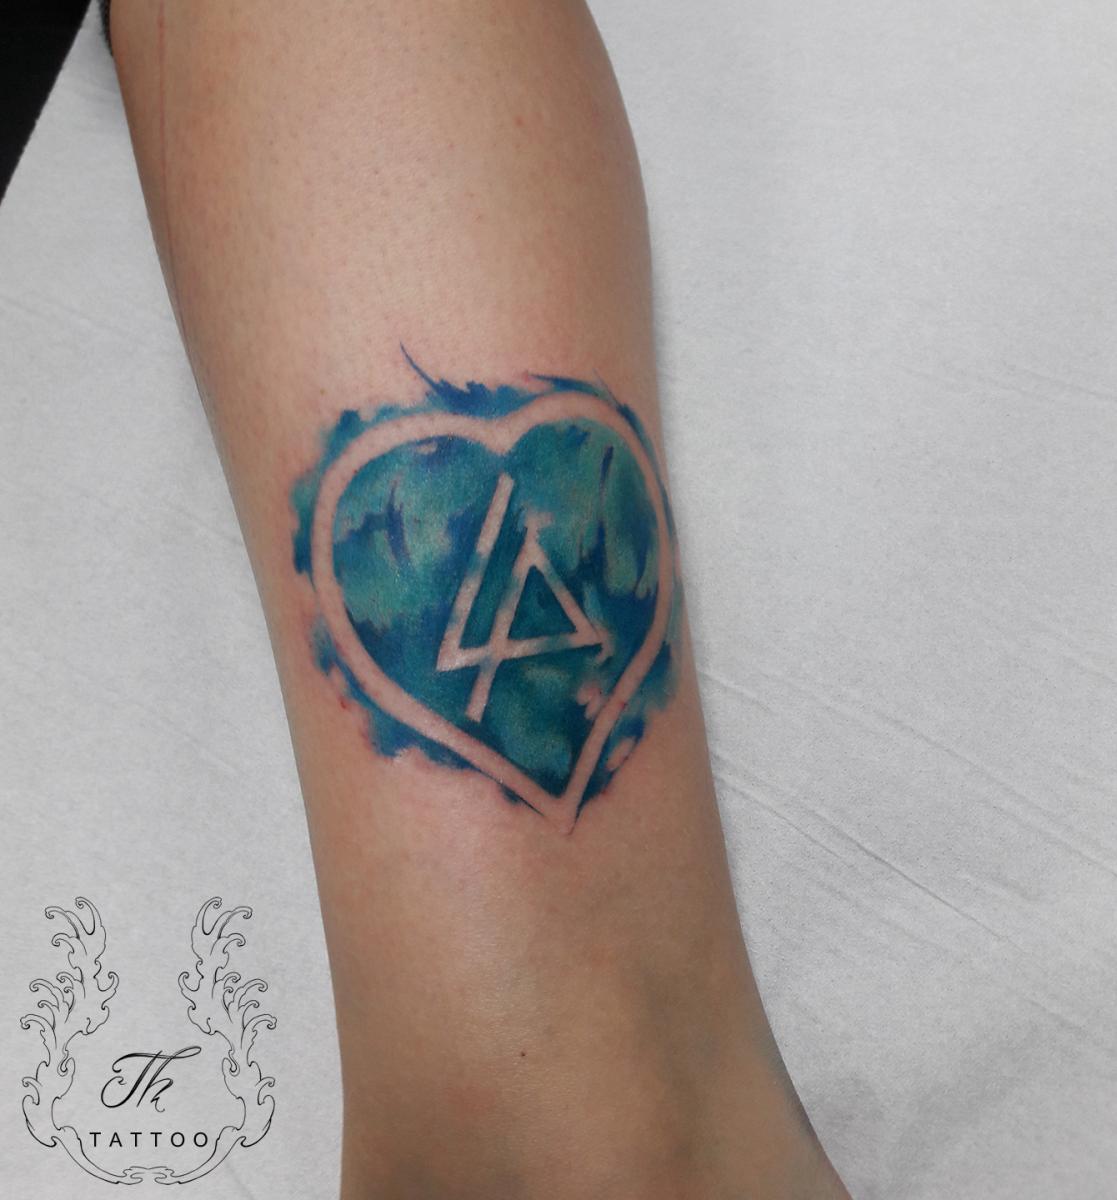 linkinparktattoo_tatuaje fete_tatuajebucuresti_tattoobucharest_watercolortattoo_tatuajefete.jpg